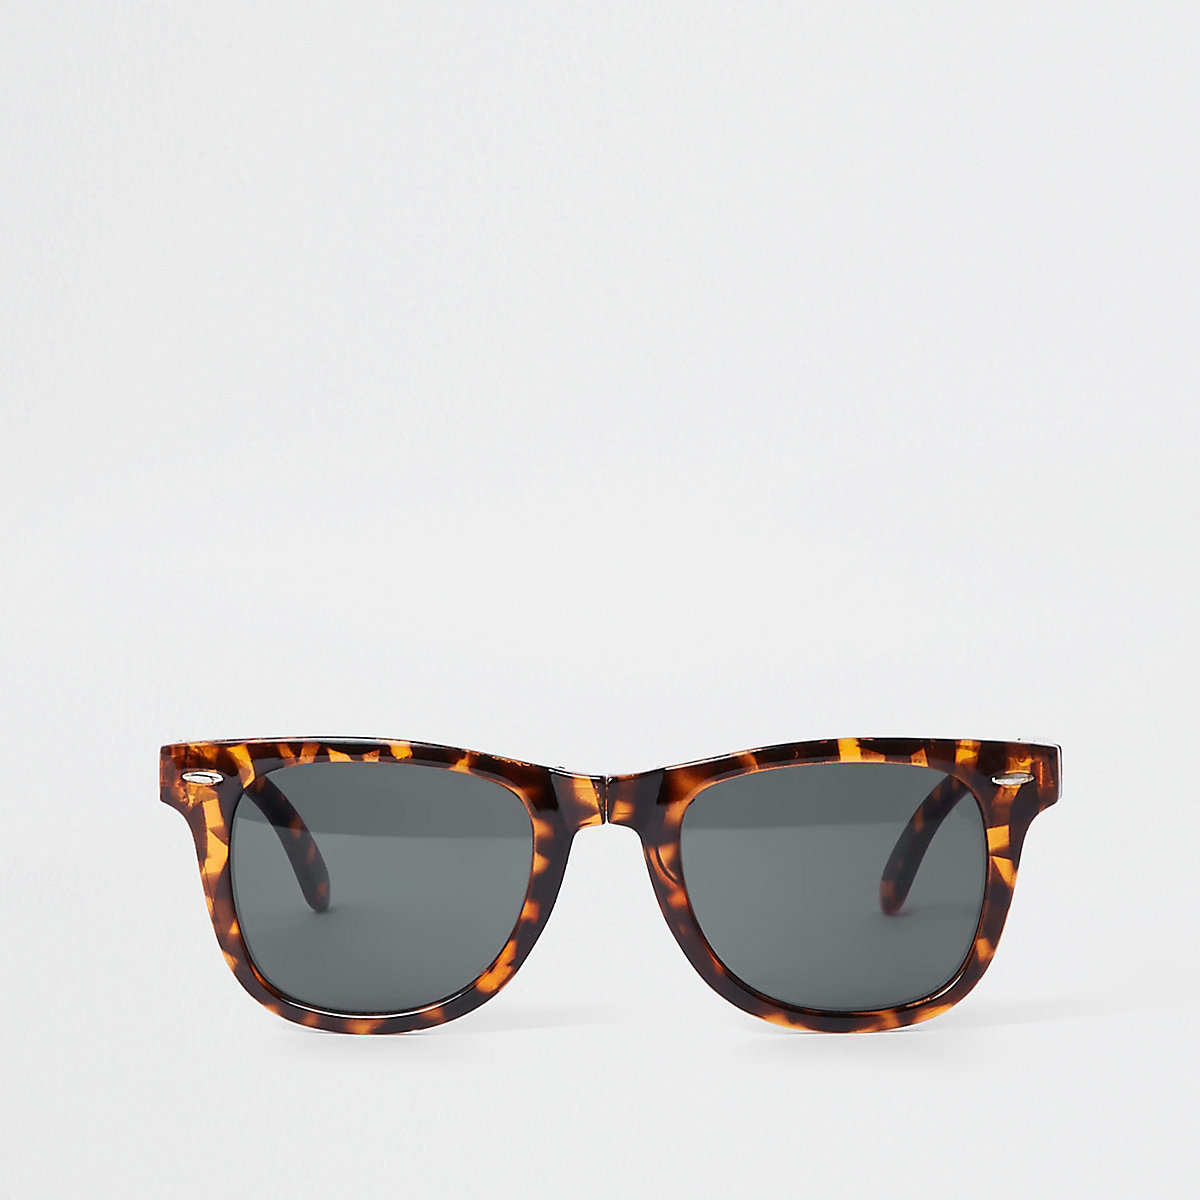 Brown tortoise shell foldable sunglasses